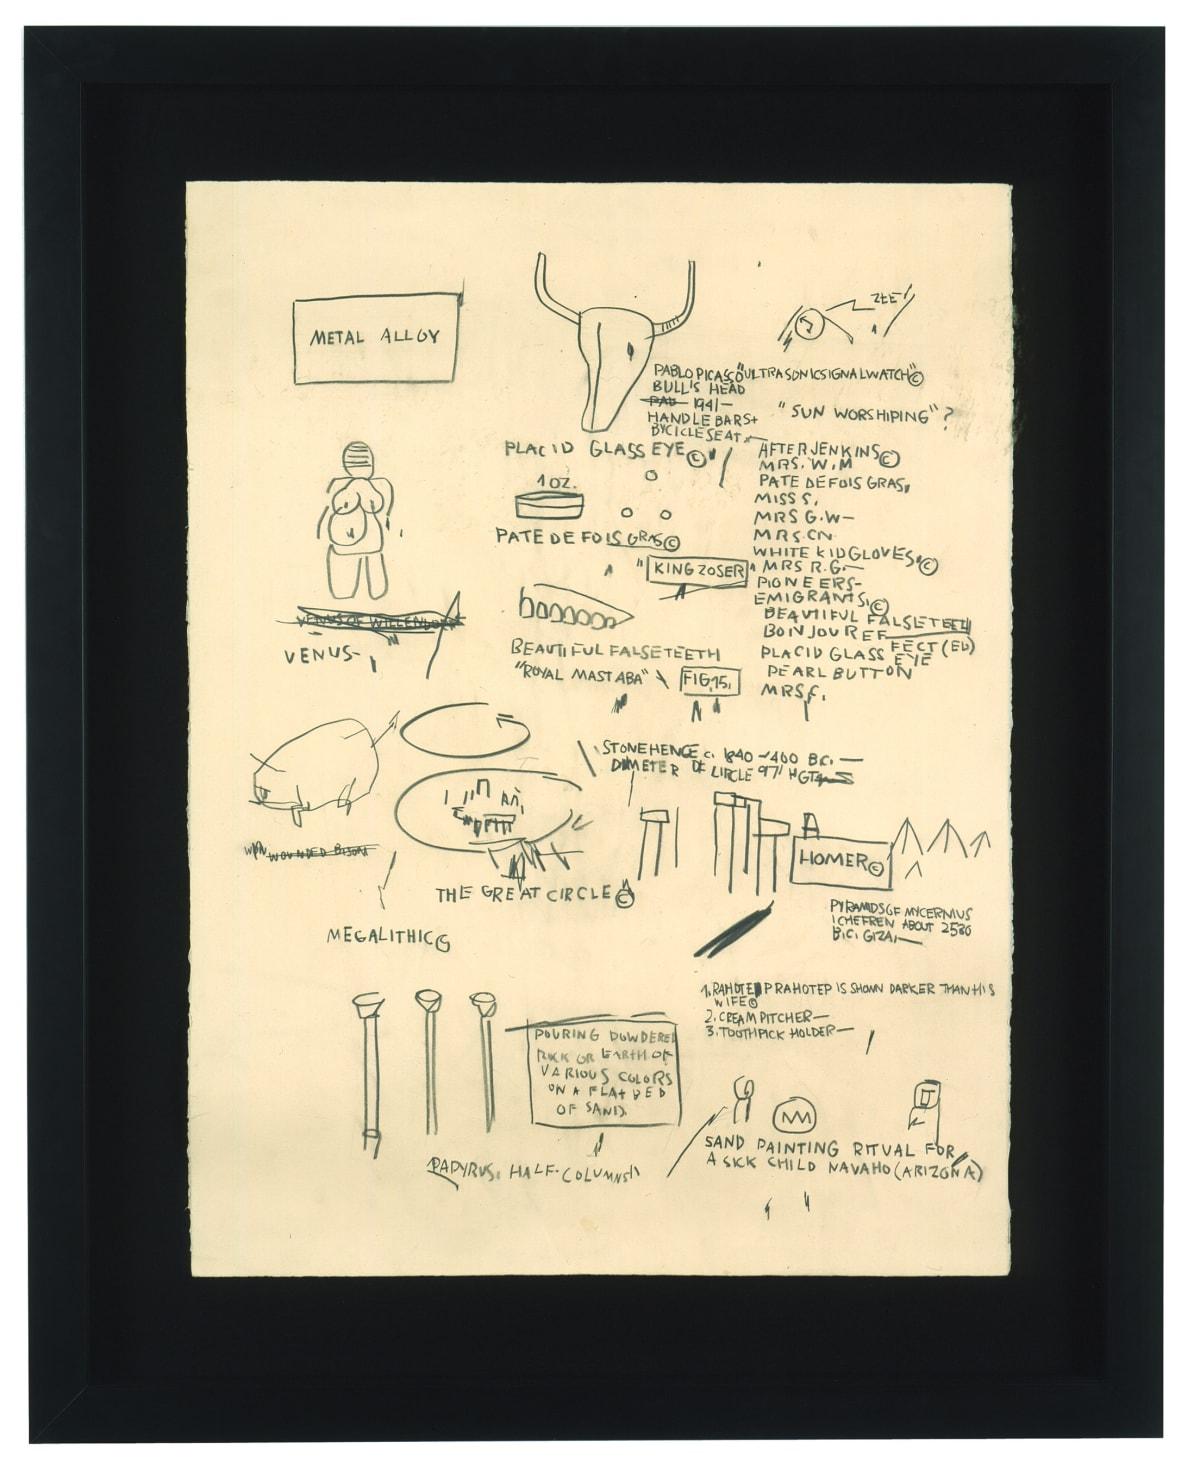 Jean-Michel Basquiat Untitled (Picasso), 1984 Graphite on Paper 76.2 x 57.1 cm